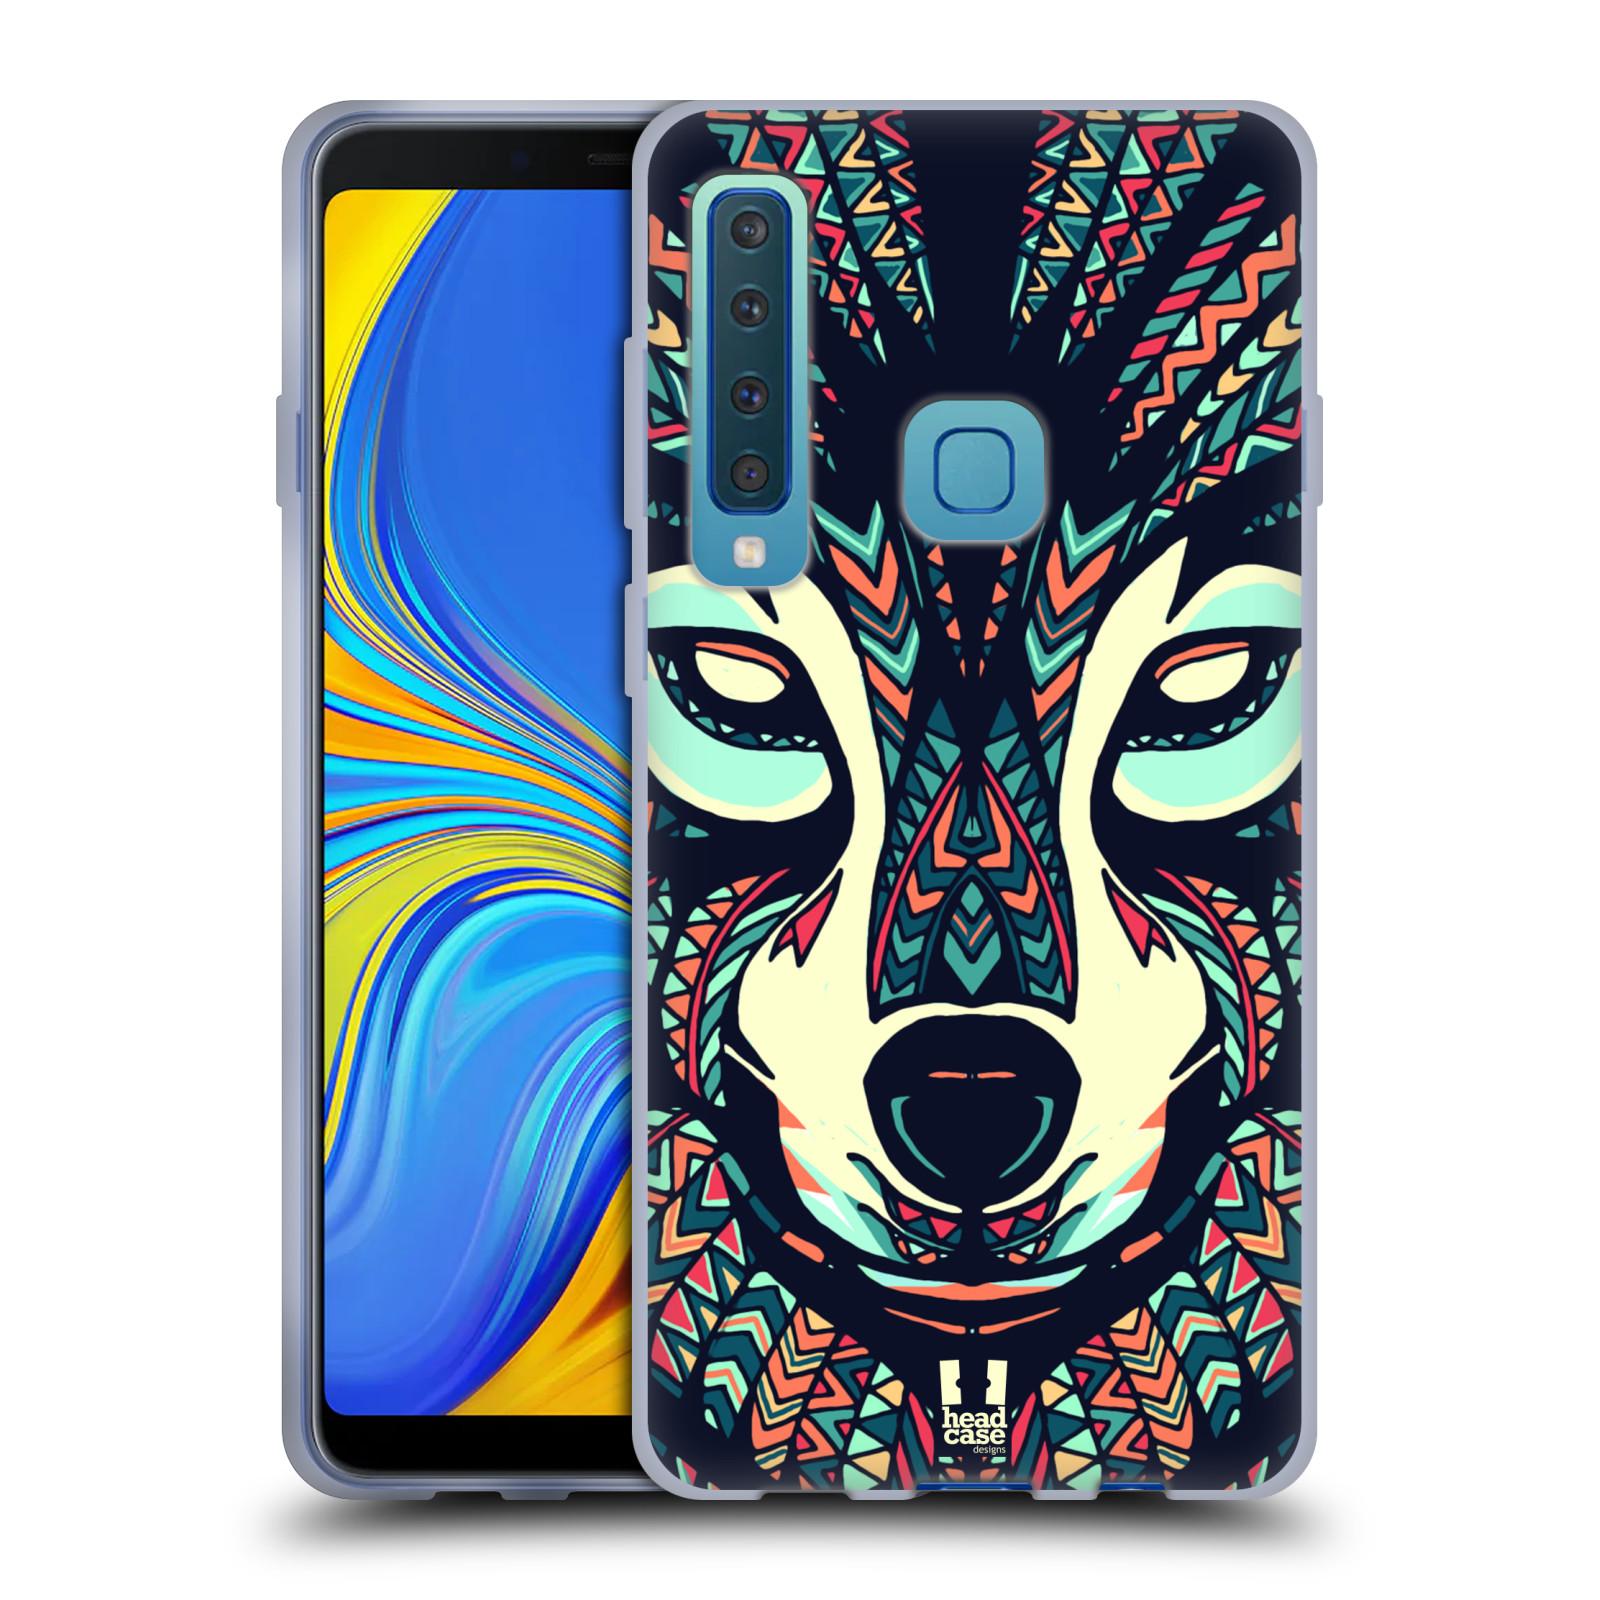 Silikonové pouzdro na mobil Samsung Galaxy A9 (2018) - Head Case - AZTEC VLK